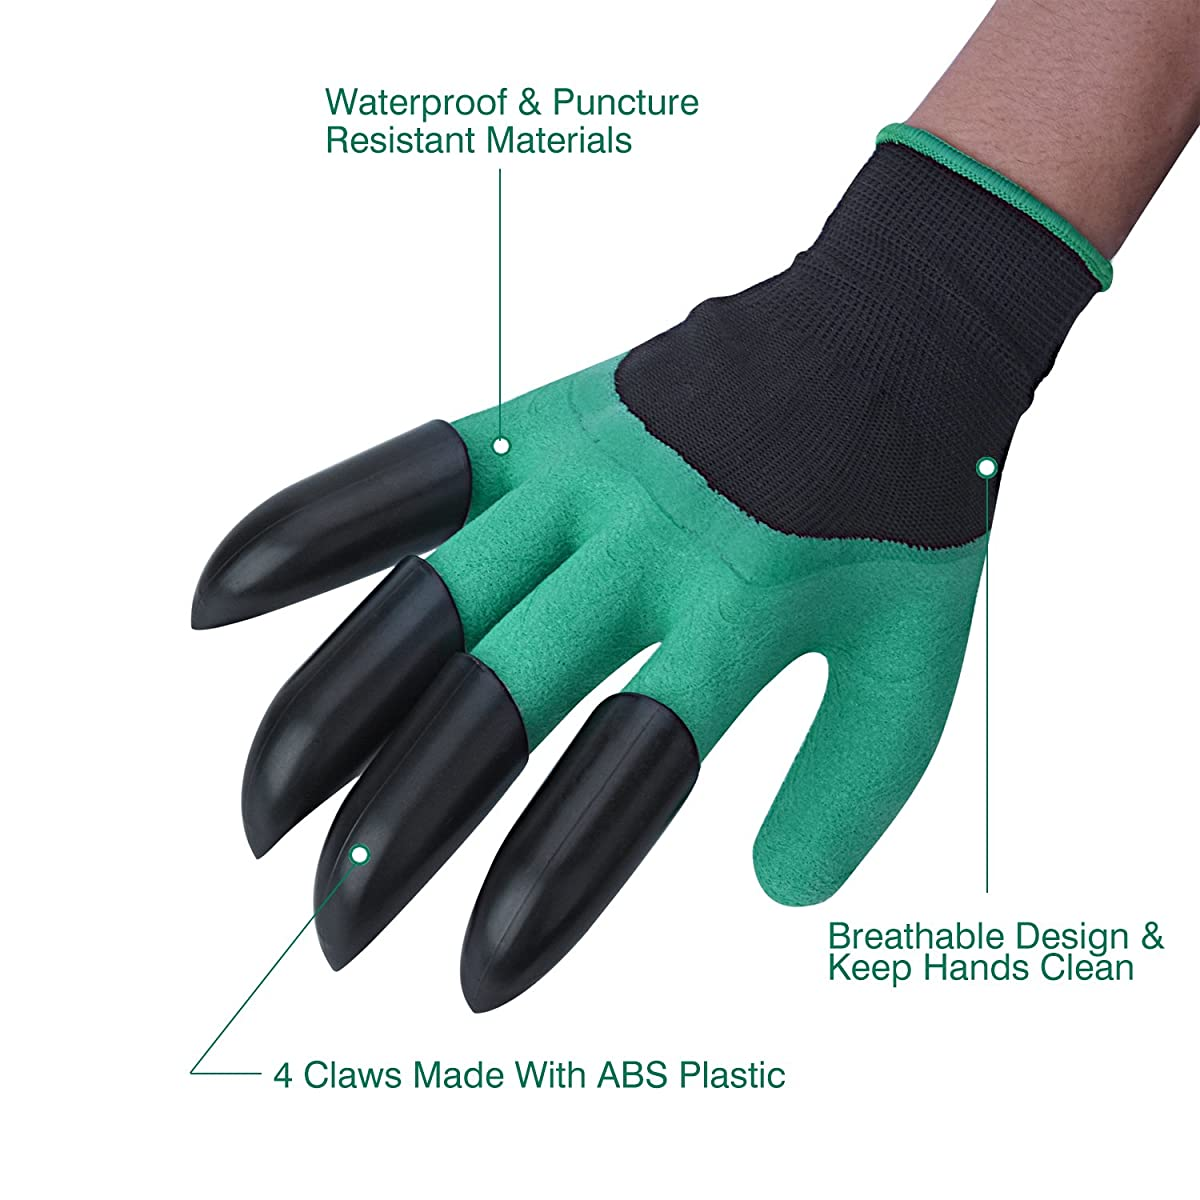 WEBSUN Garden Genie Gloves with Claws on EACH Hand Waterproof Digging Gloves for Gardening